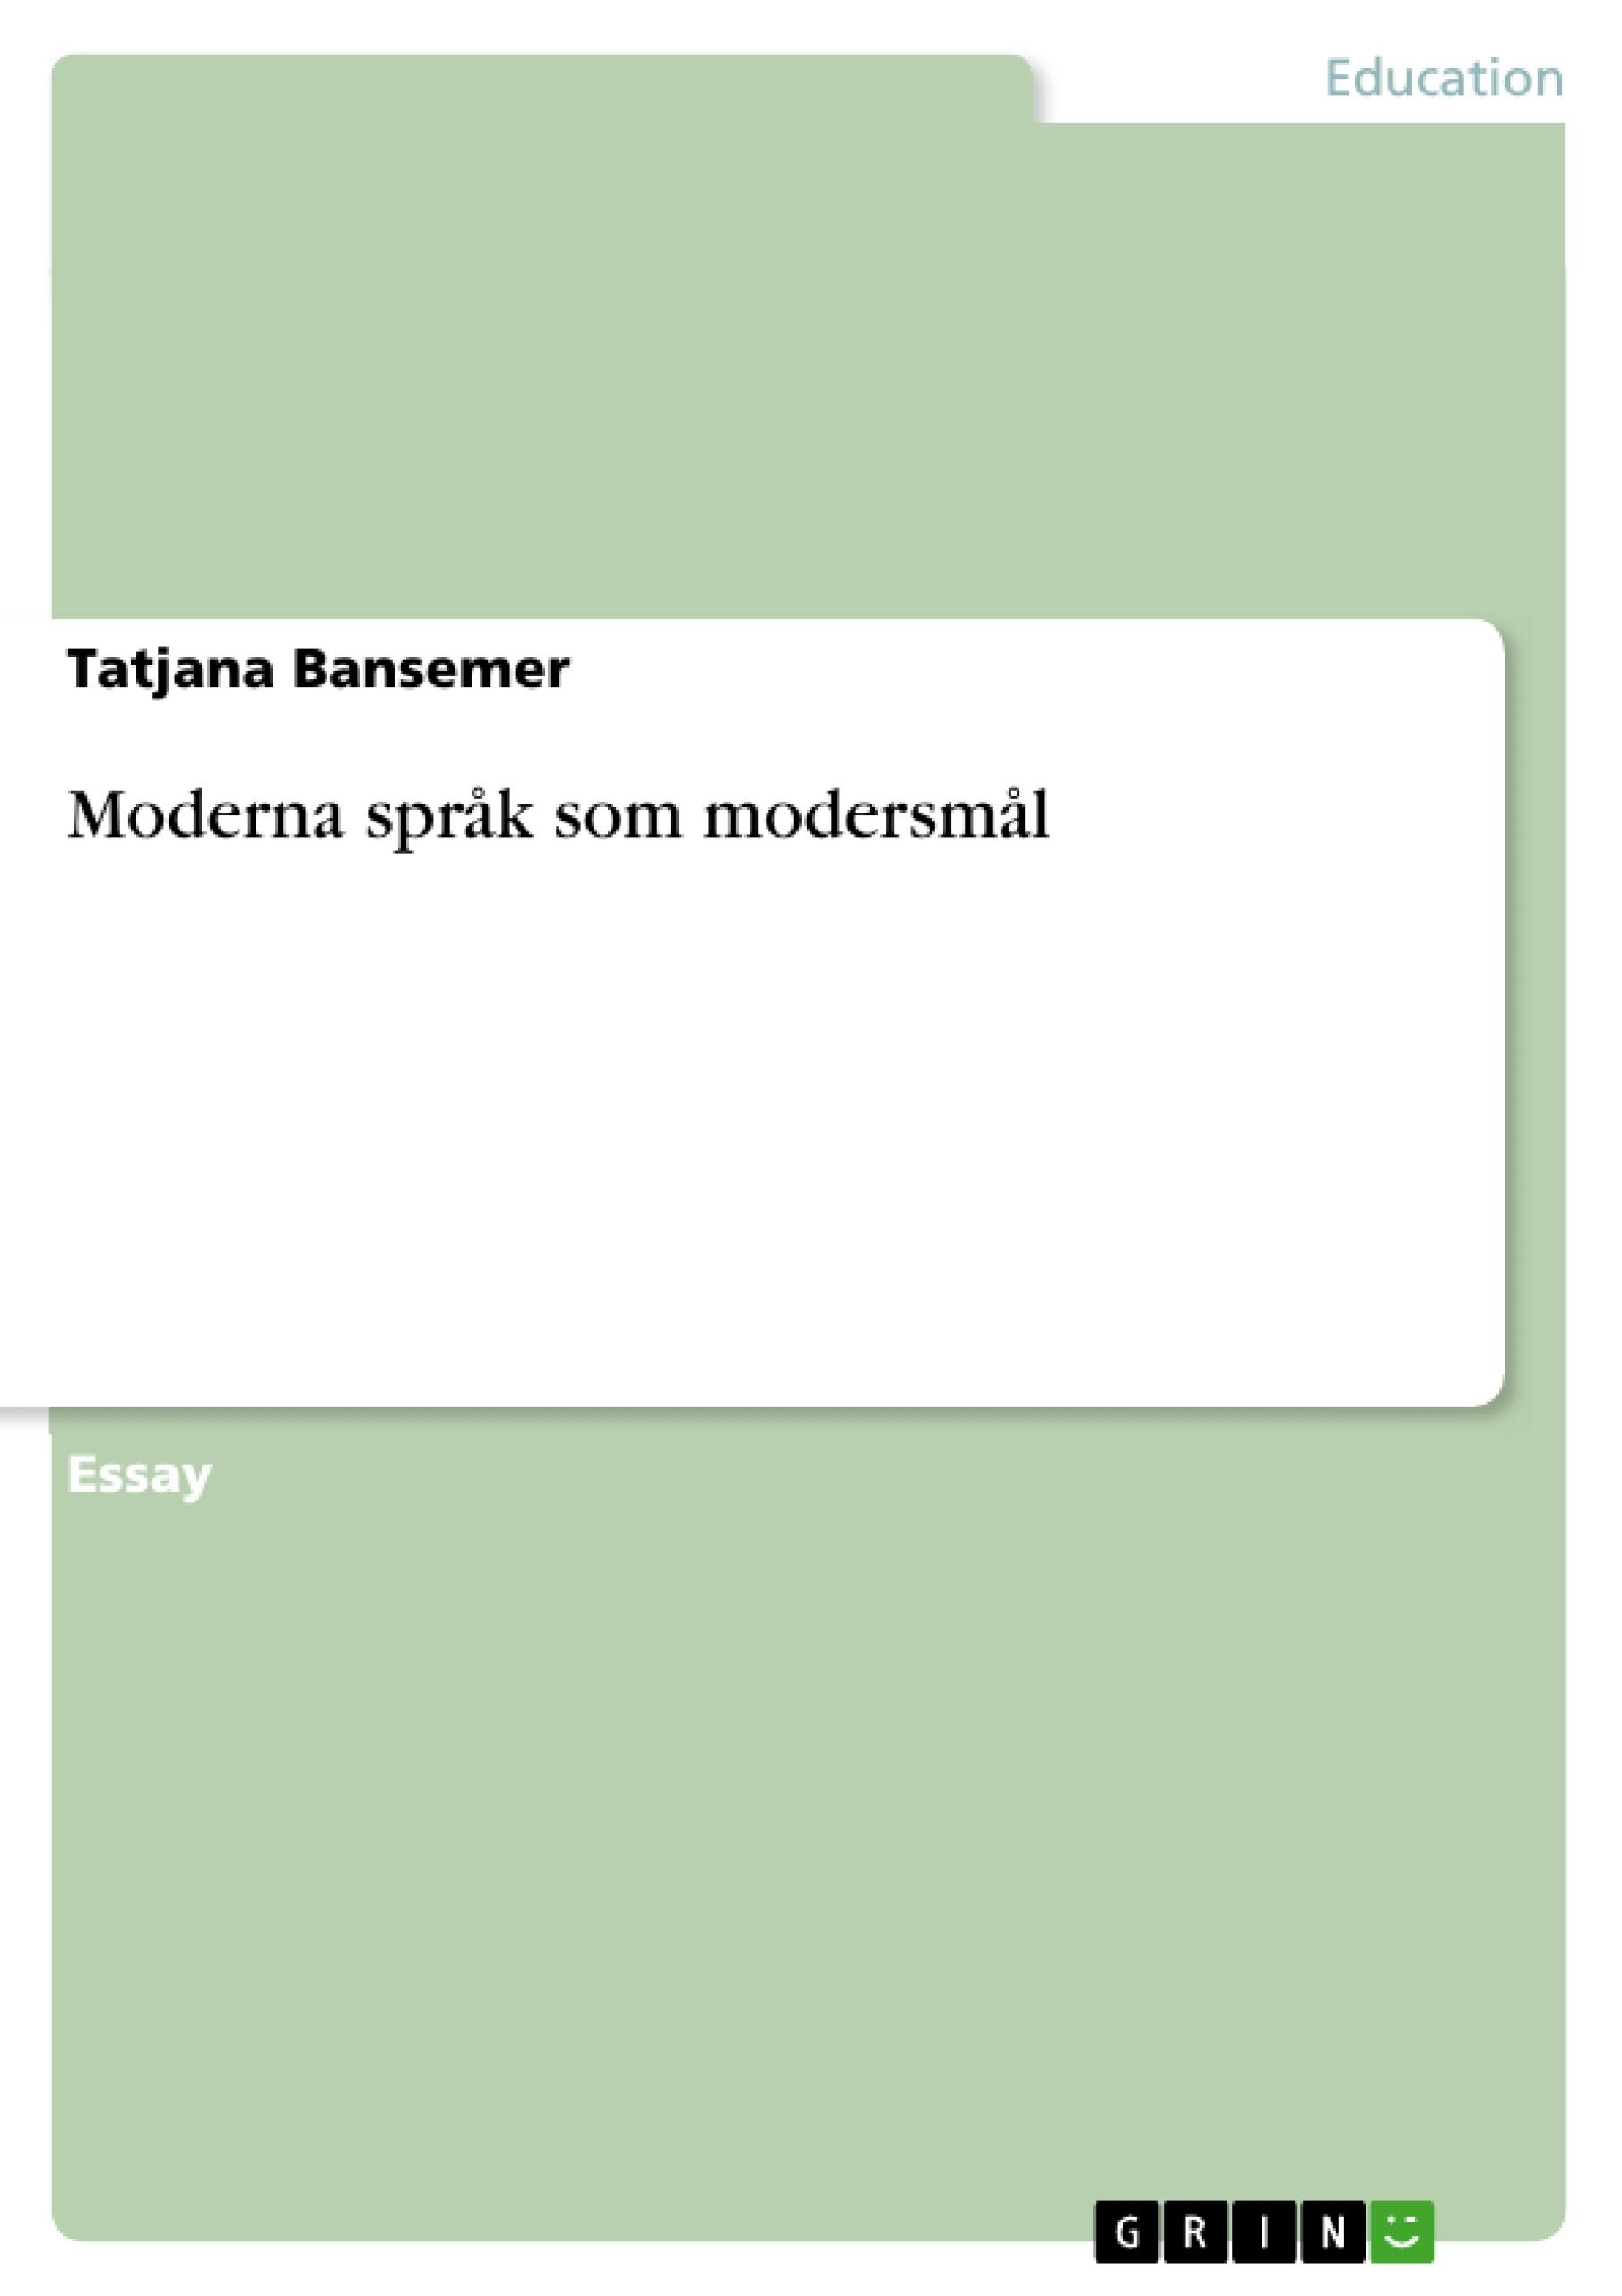 Title: Moderna språk som modersmål